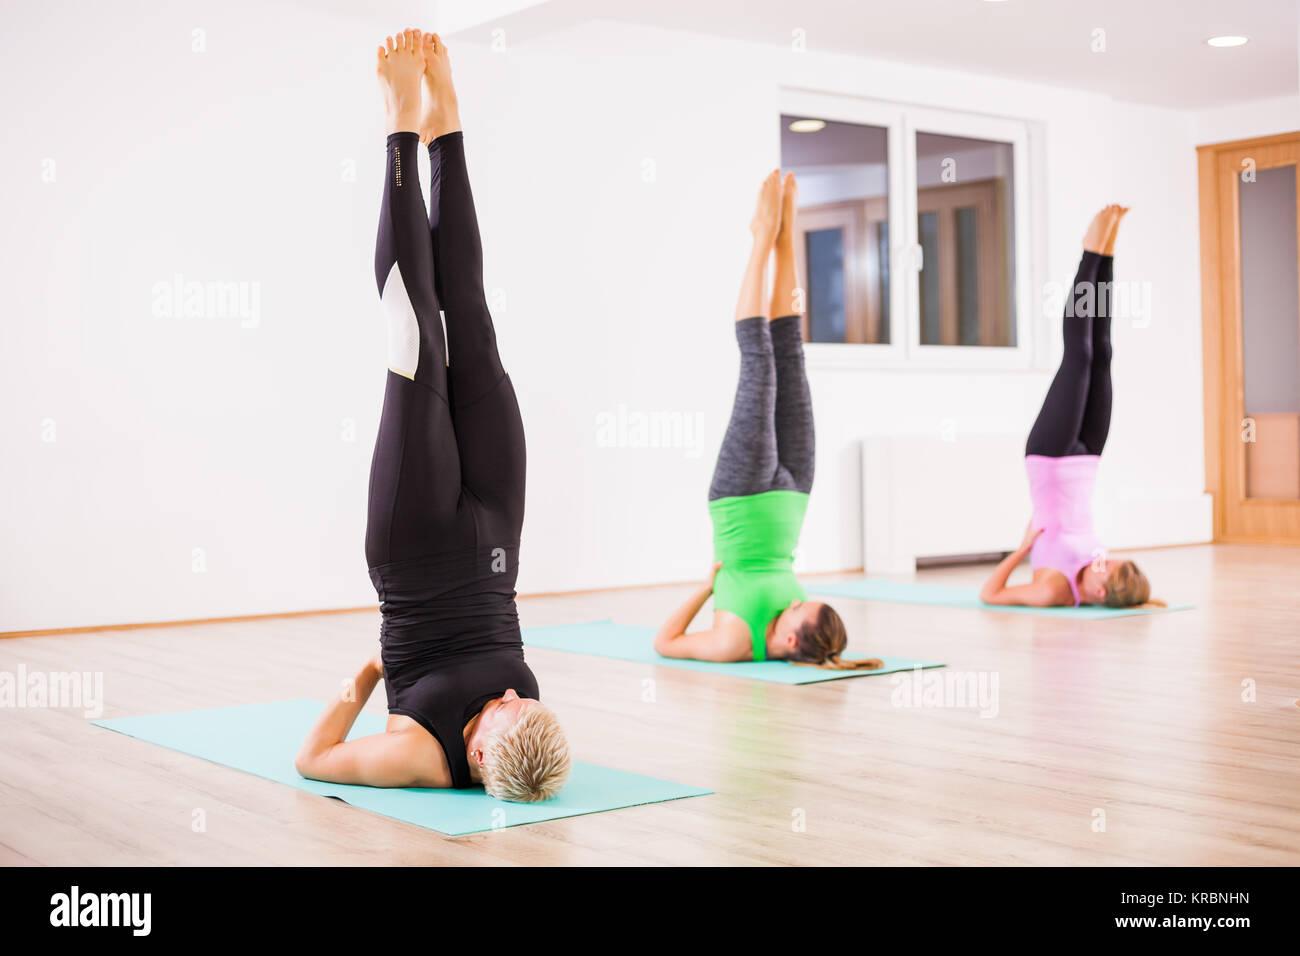 Three girls practicing yoga, Salamba Sarvangasana / Supported shoulder stand - Stock Image